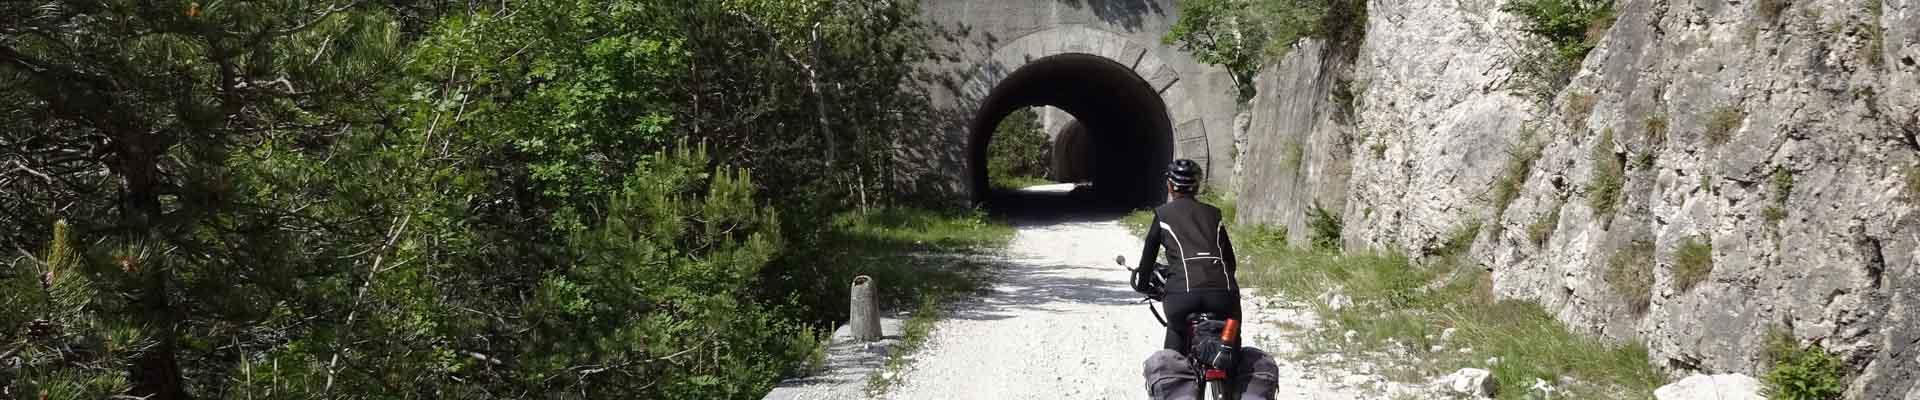 Dolomiten-Adria-Tour - Moggioudinese-Udine